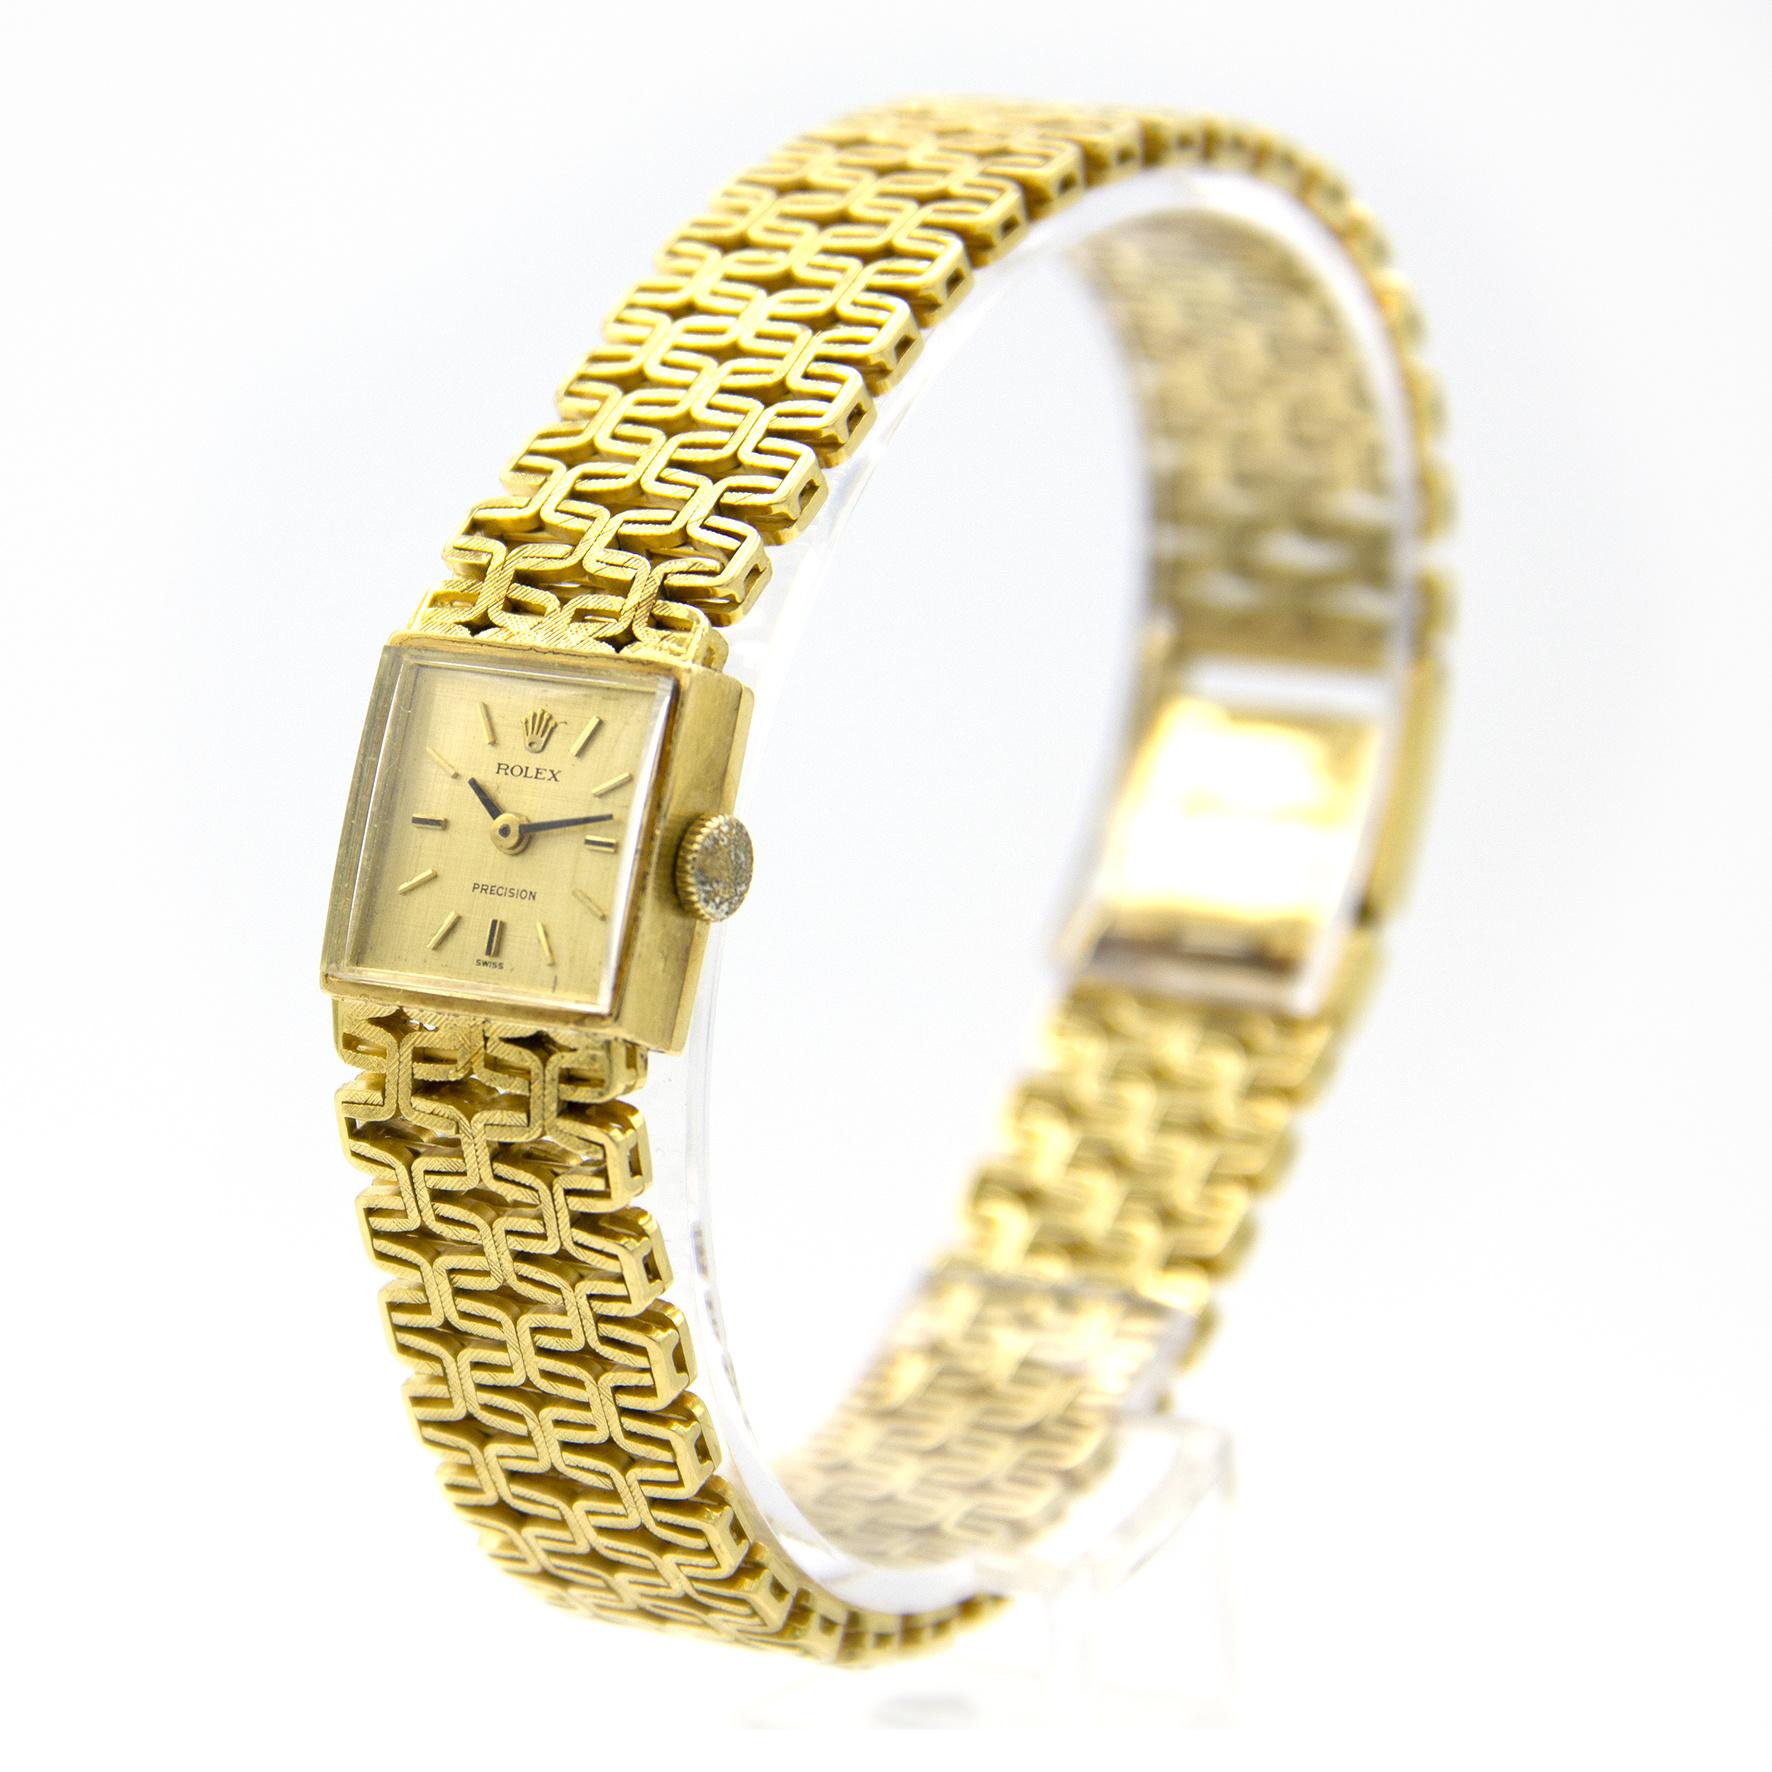 Rolex Precision -  Dames Horloge - 18 karaat geelgoud-4